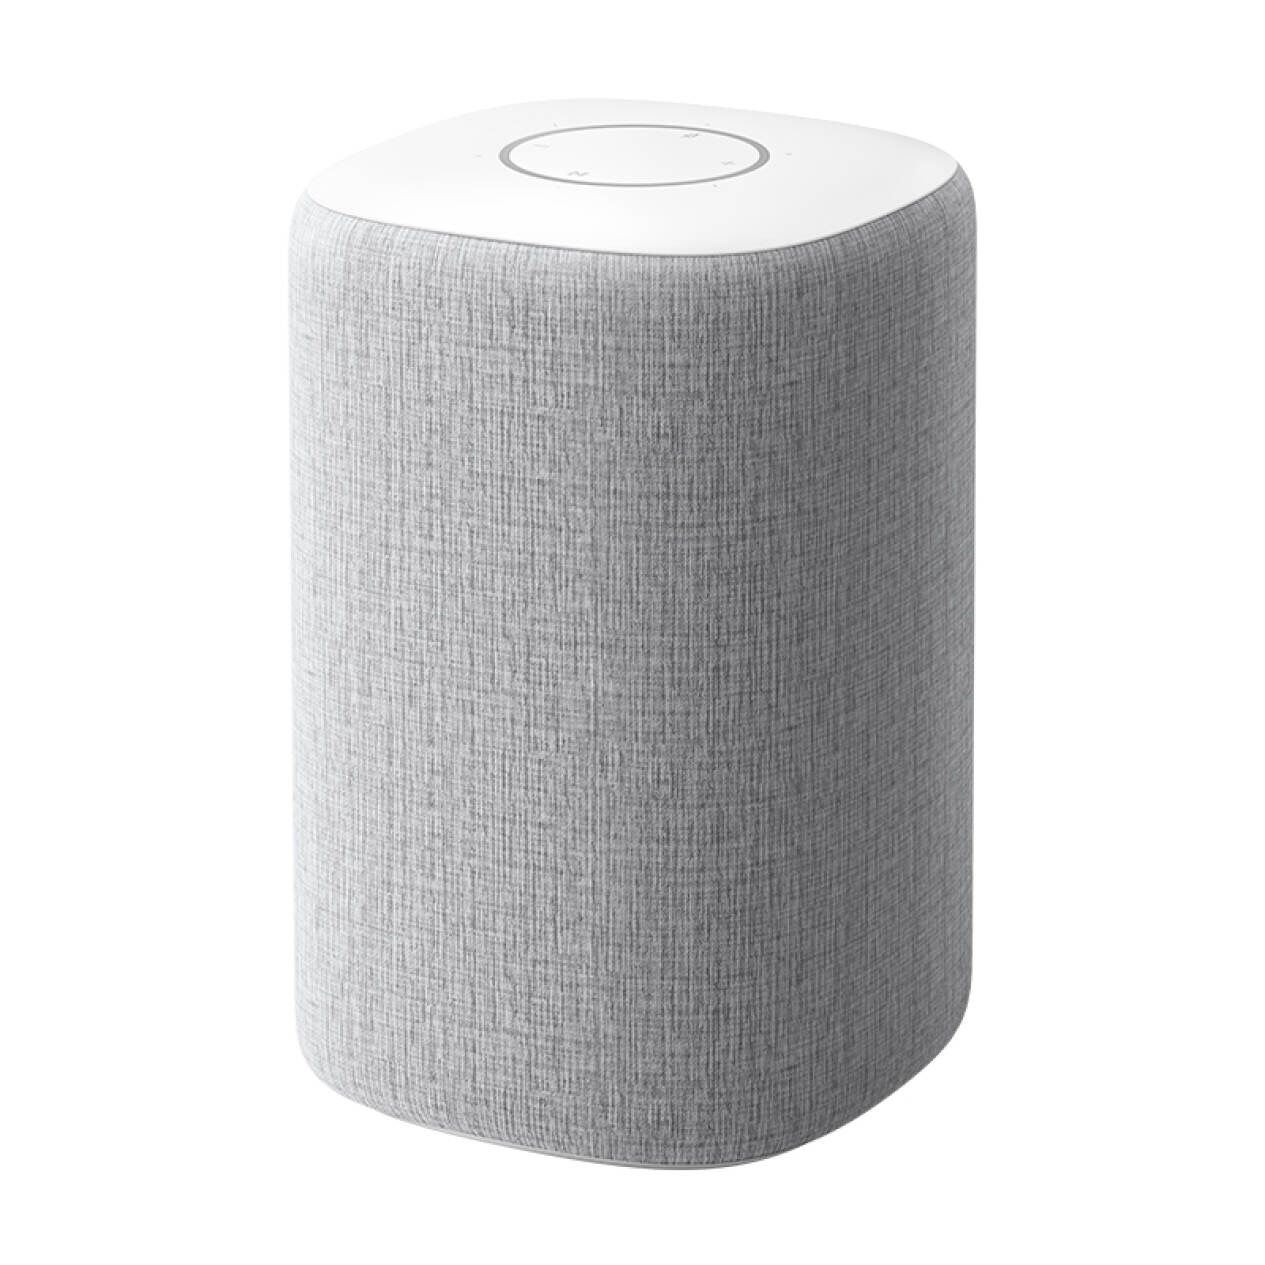 Voice remote control home appliances artificial intelligence speaker network wireless WiFi AUDIO SUB